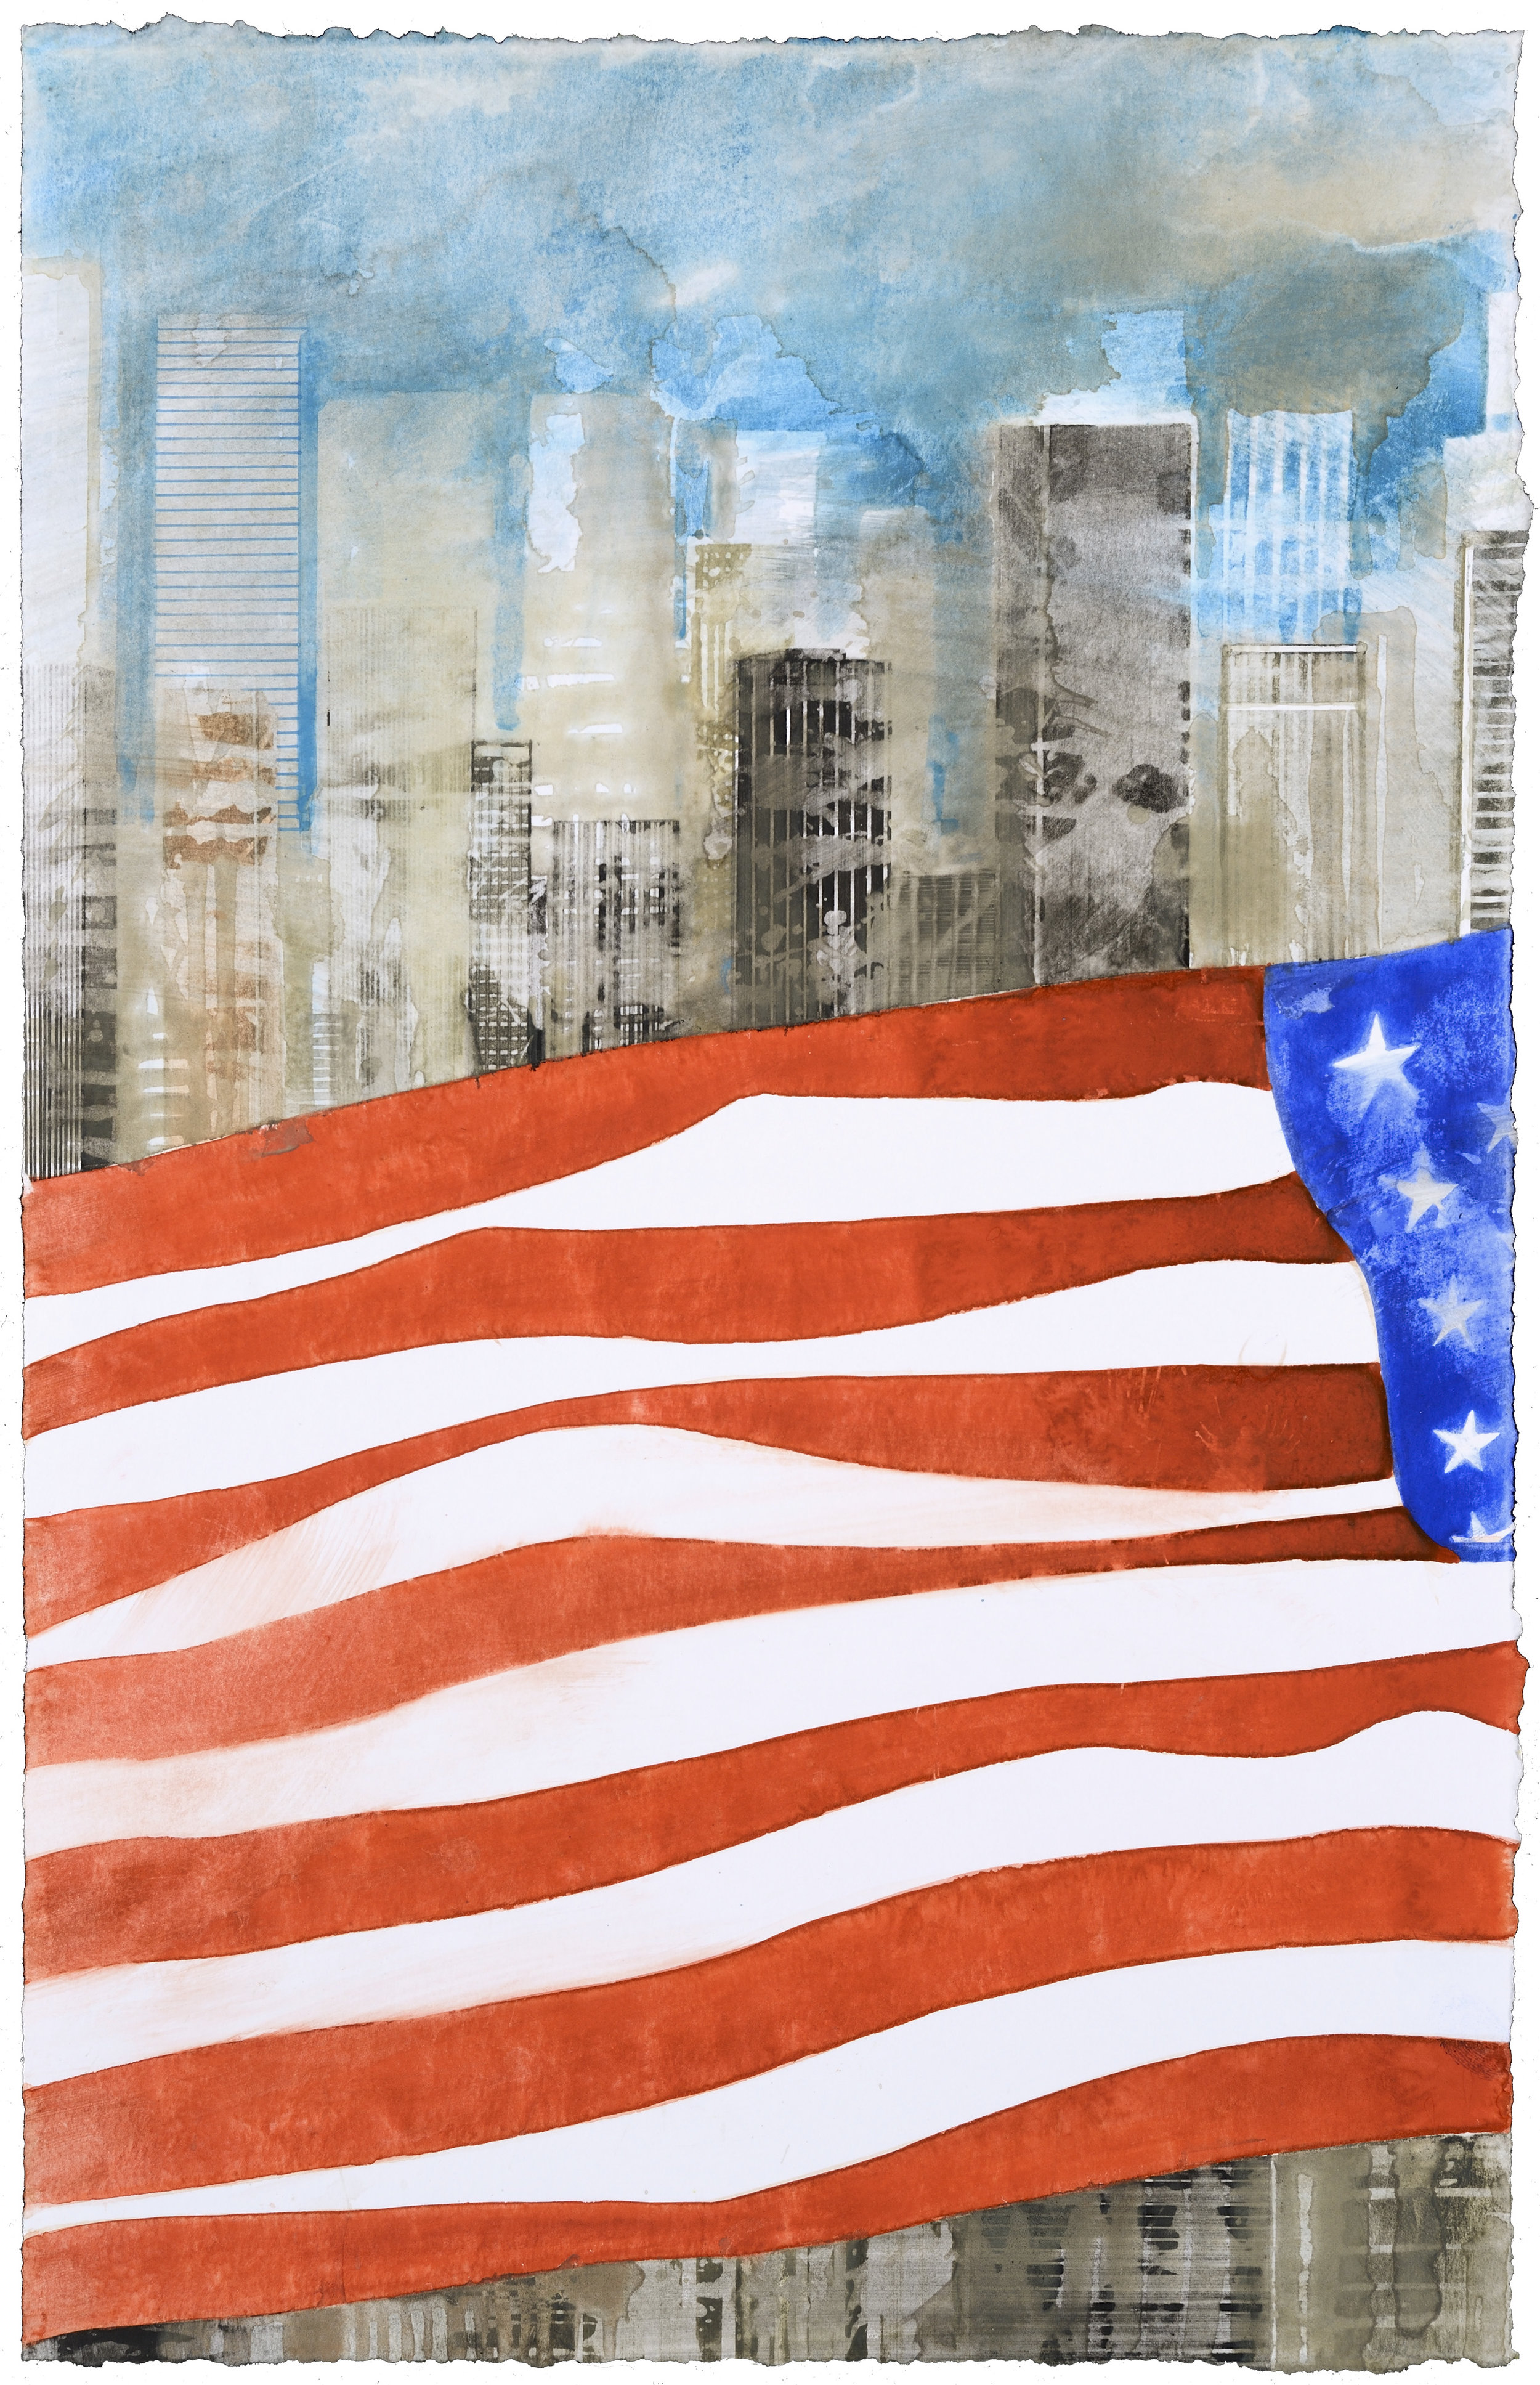 US Flag VI, watercolor, 48 x 30 cm, 19 x 12 in, 2015